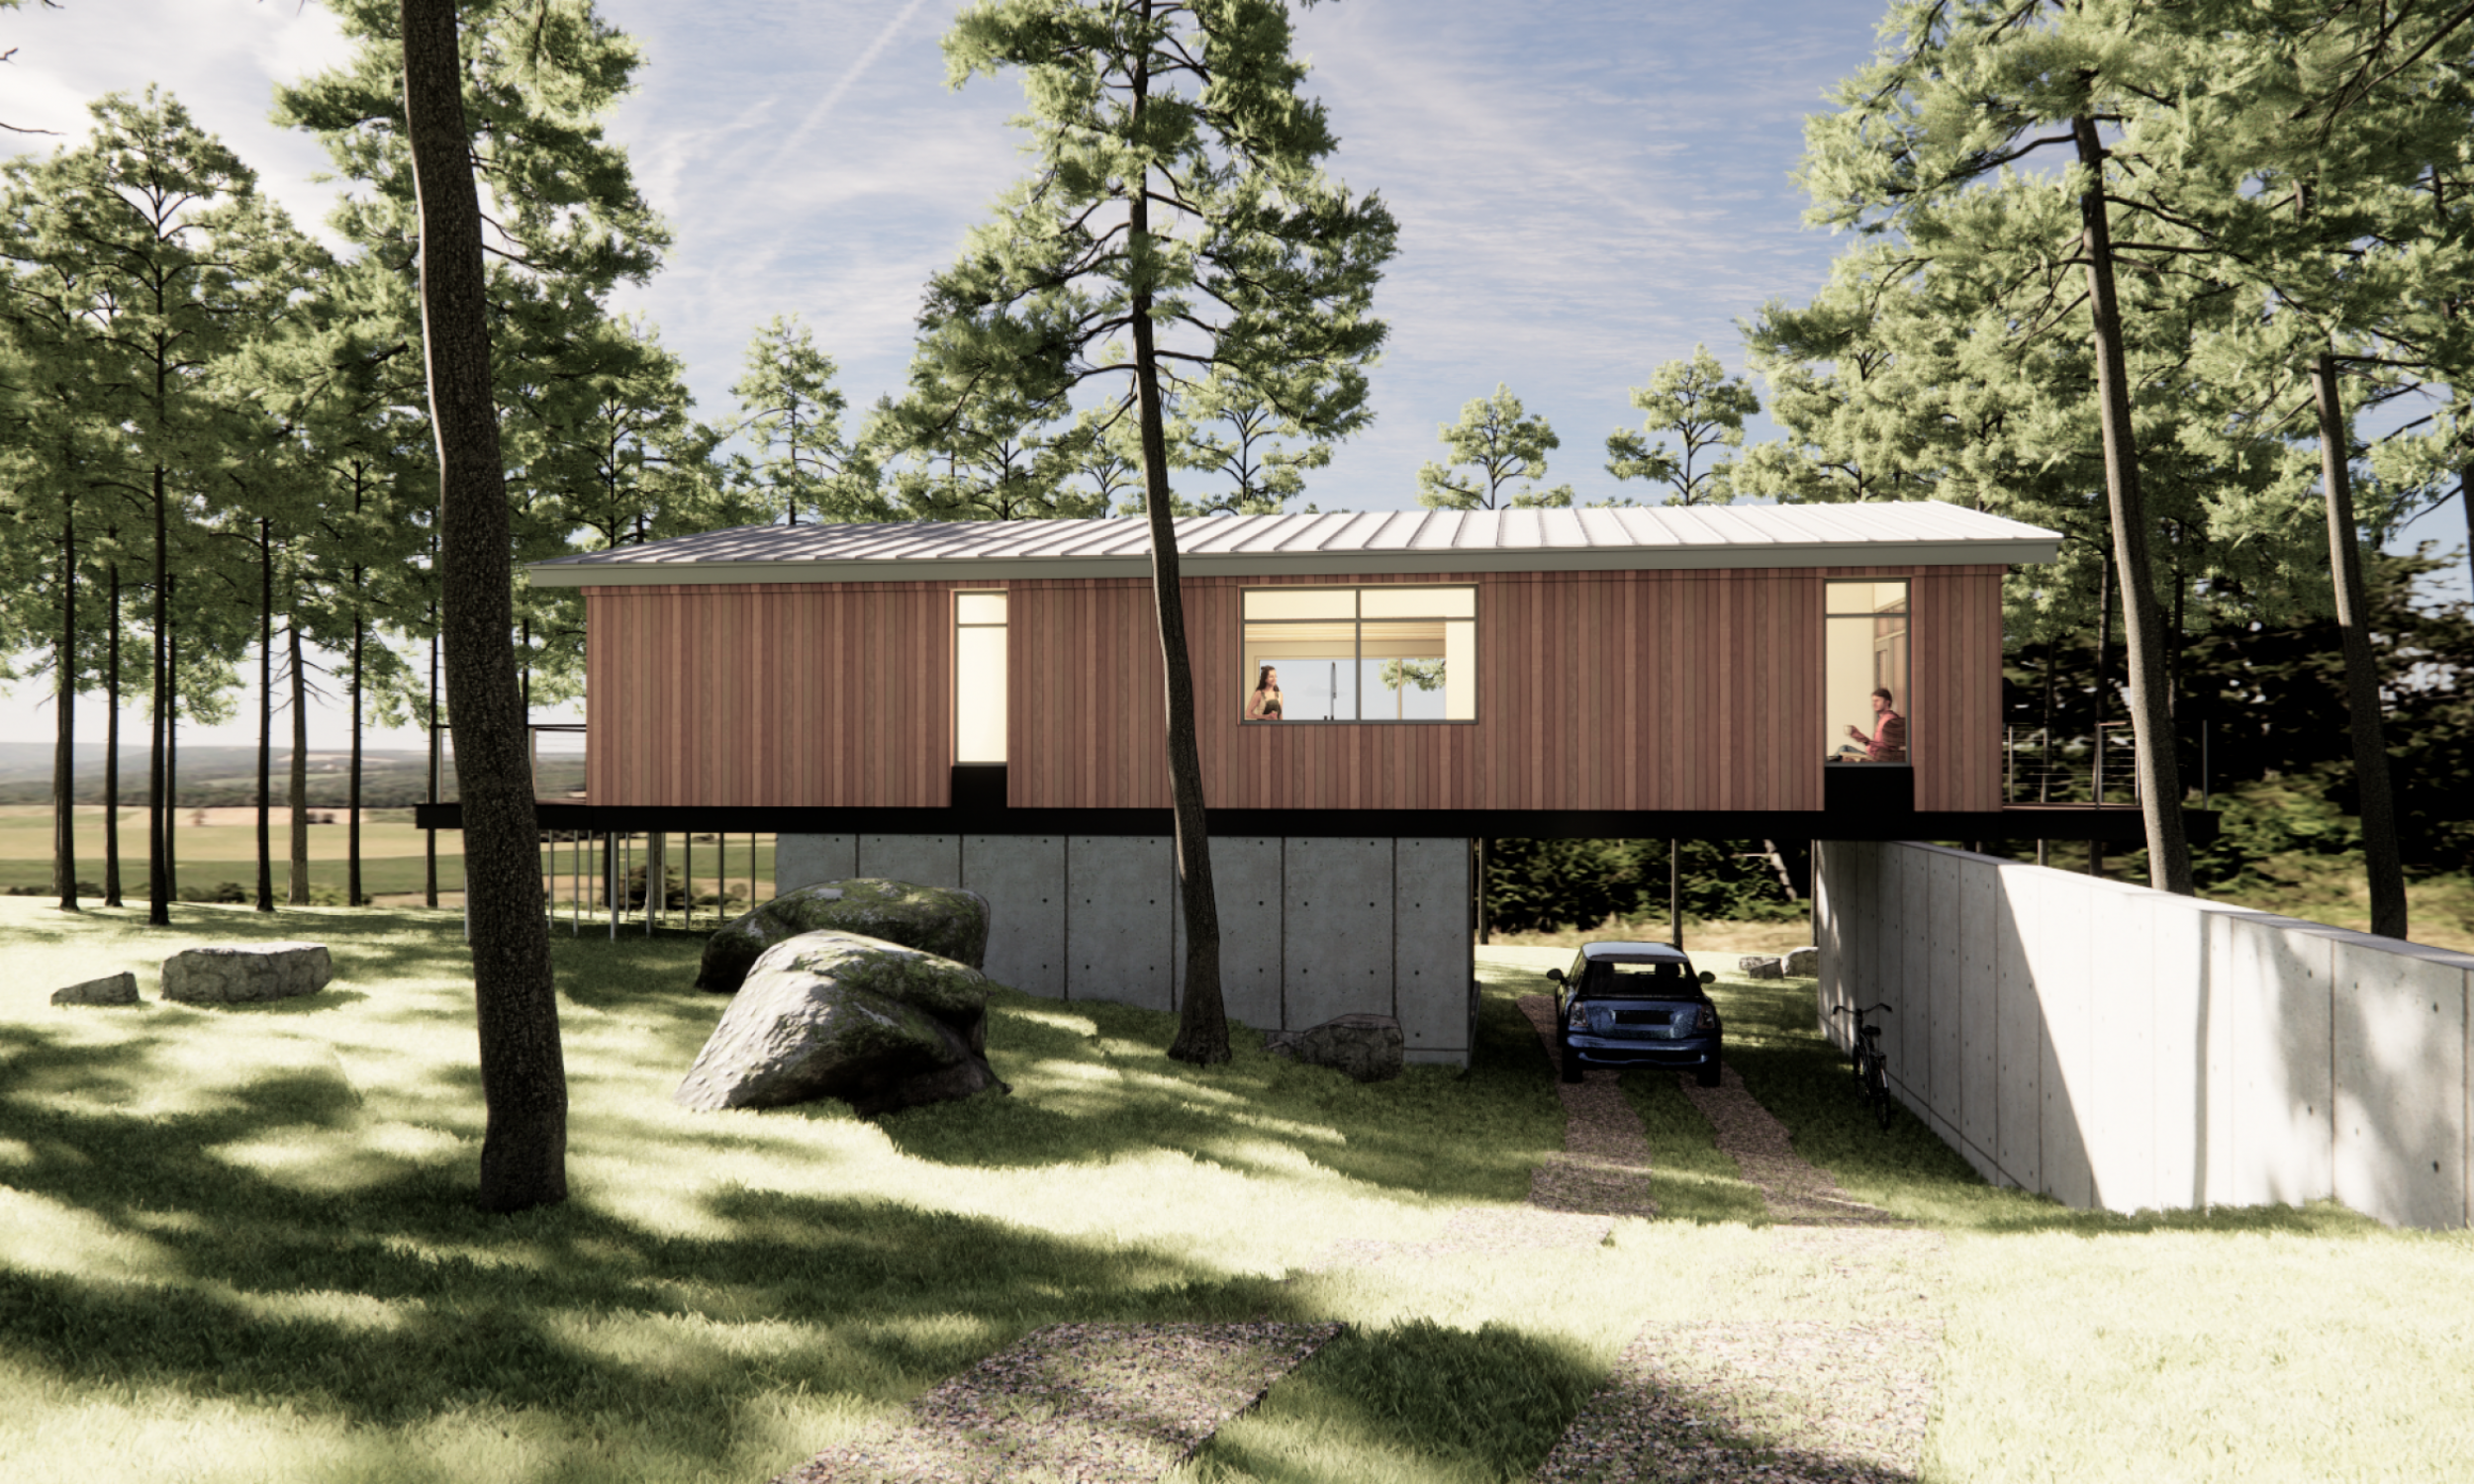 prefabricated design, cedar siding, carport, raised above the ground, Maine architect